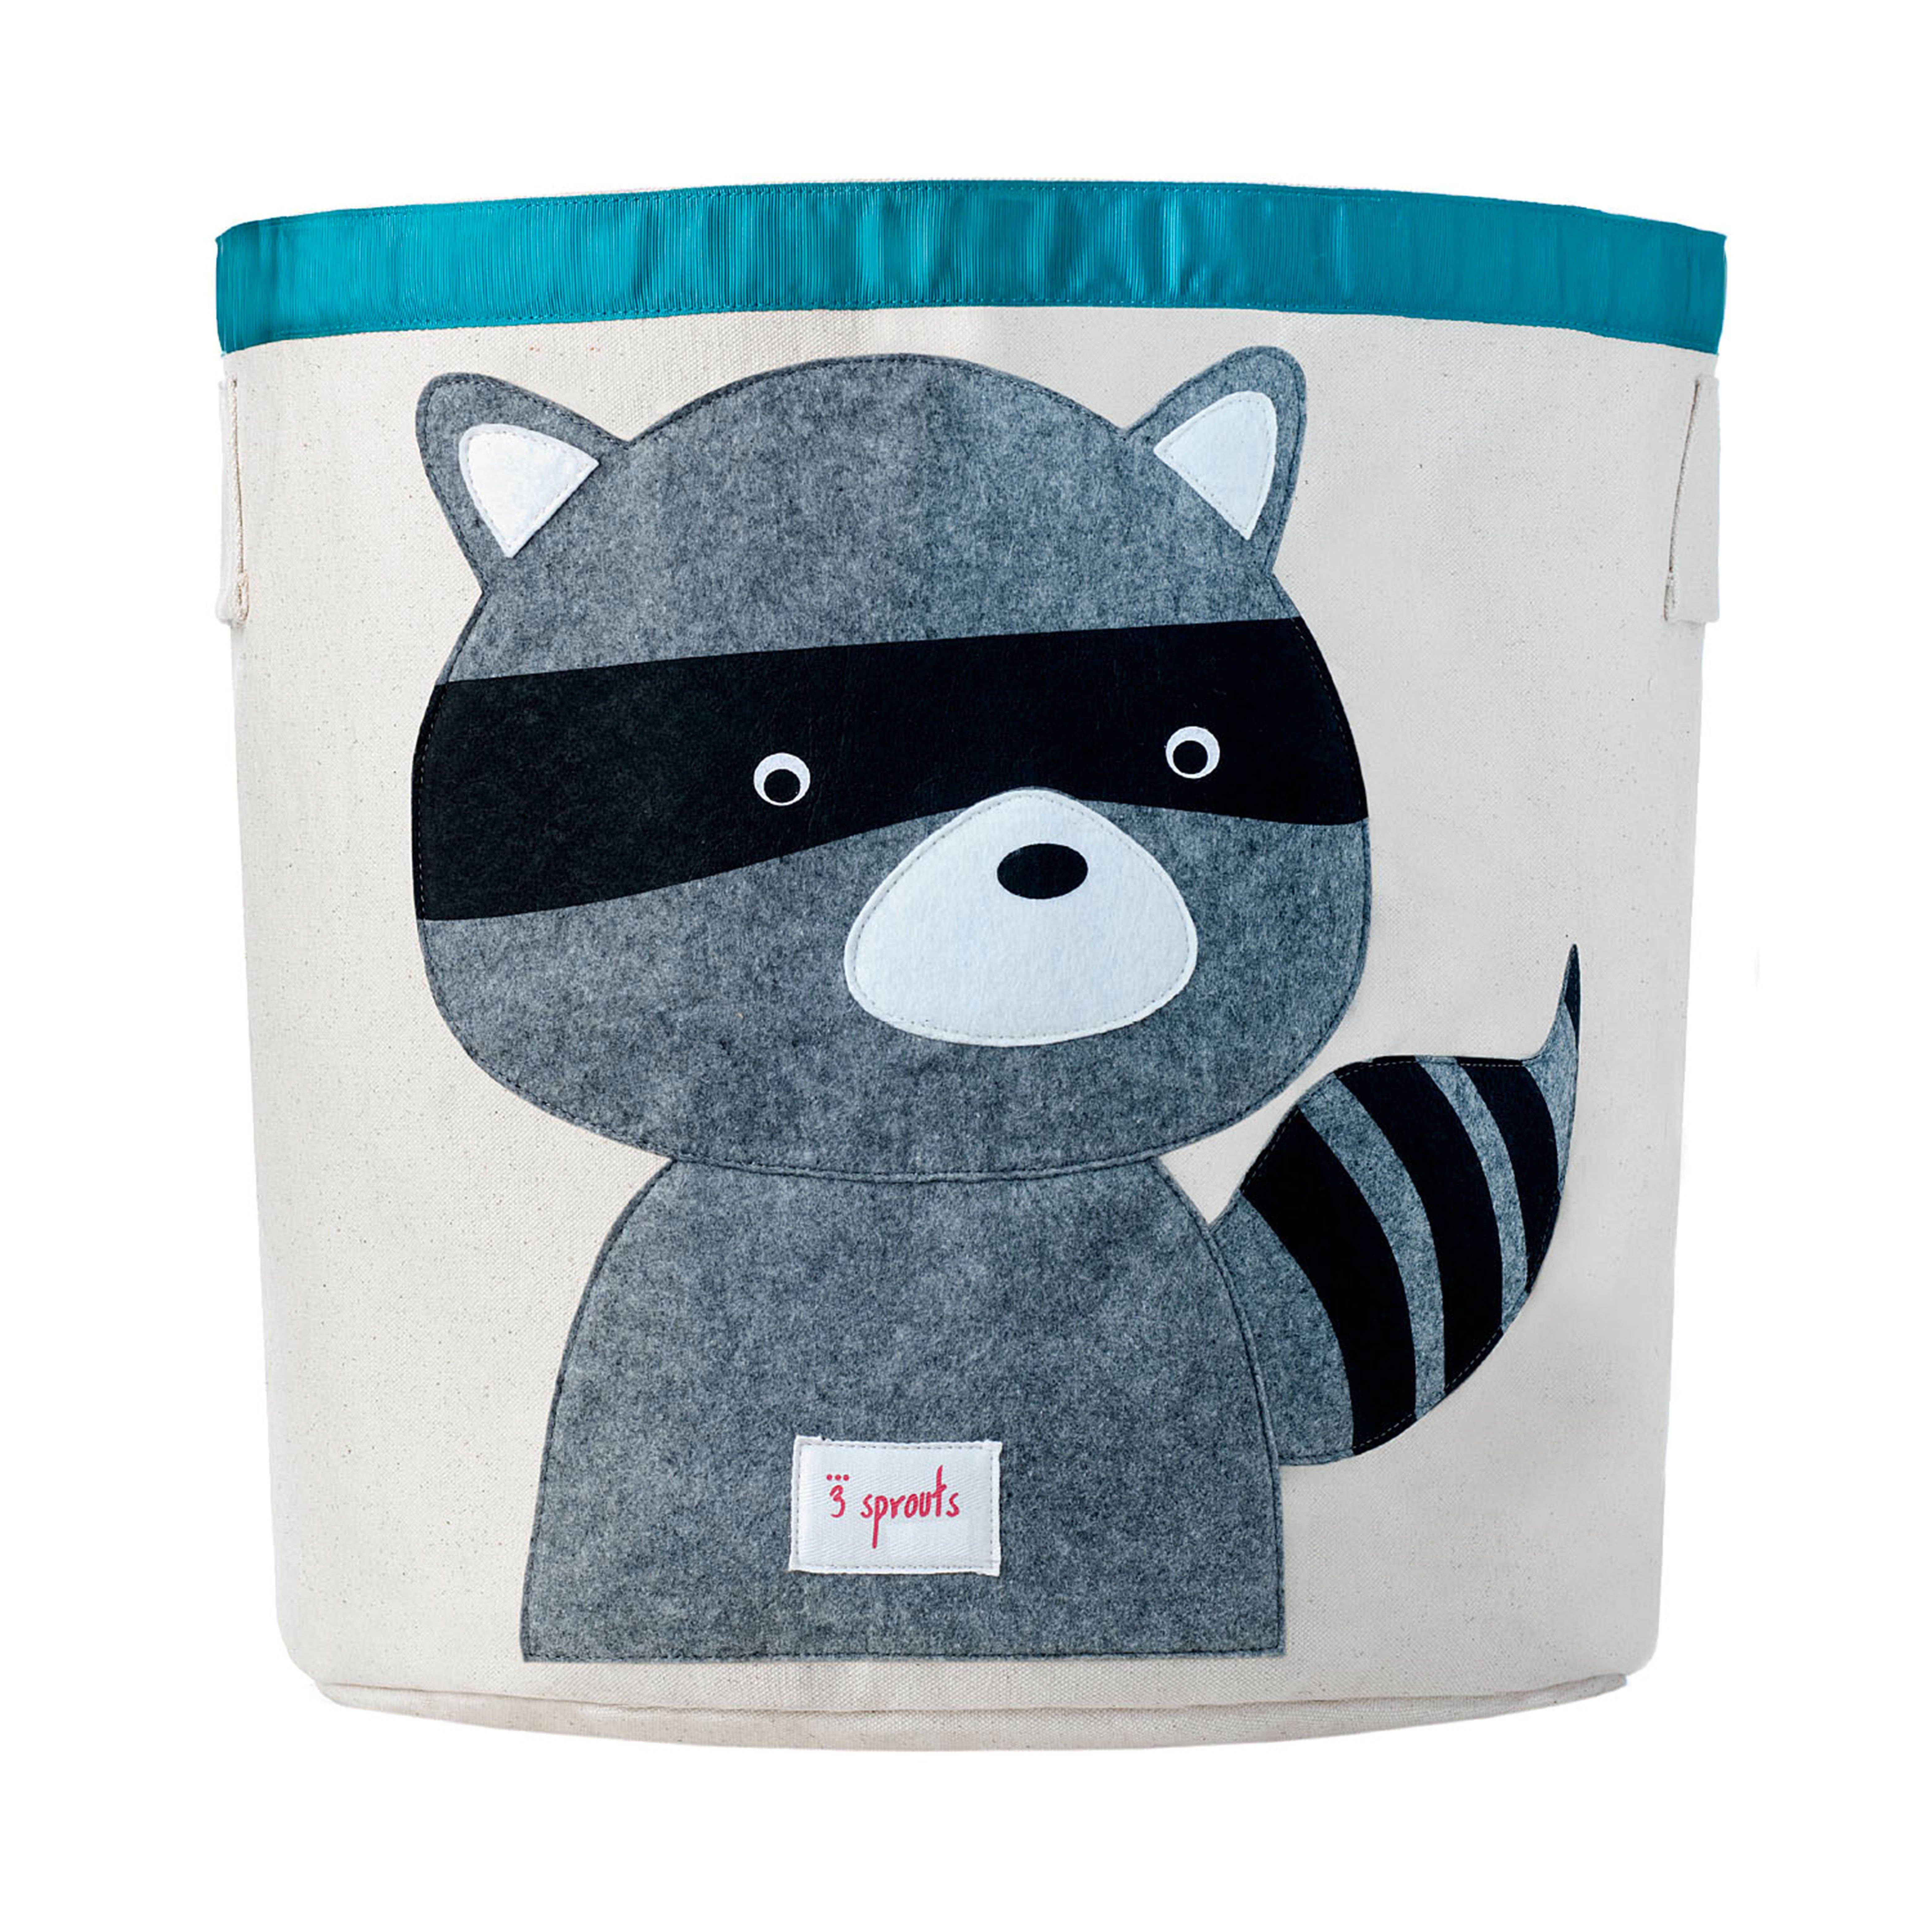 3 Sprouts - Storage Bin - Gray Raccoon